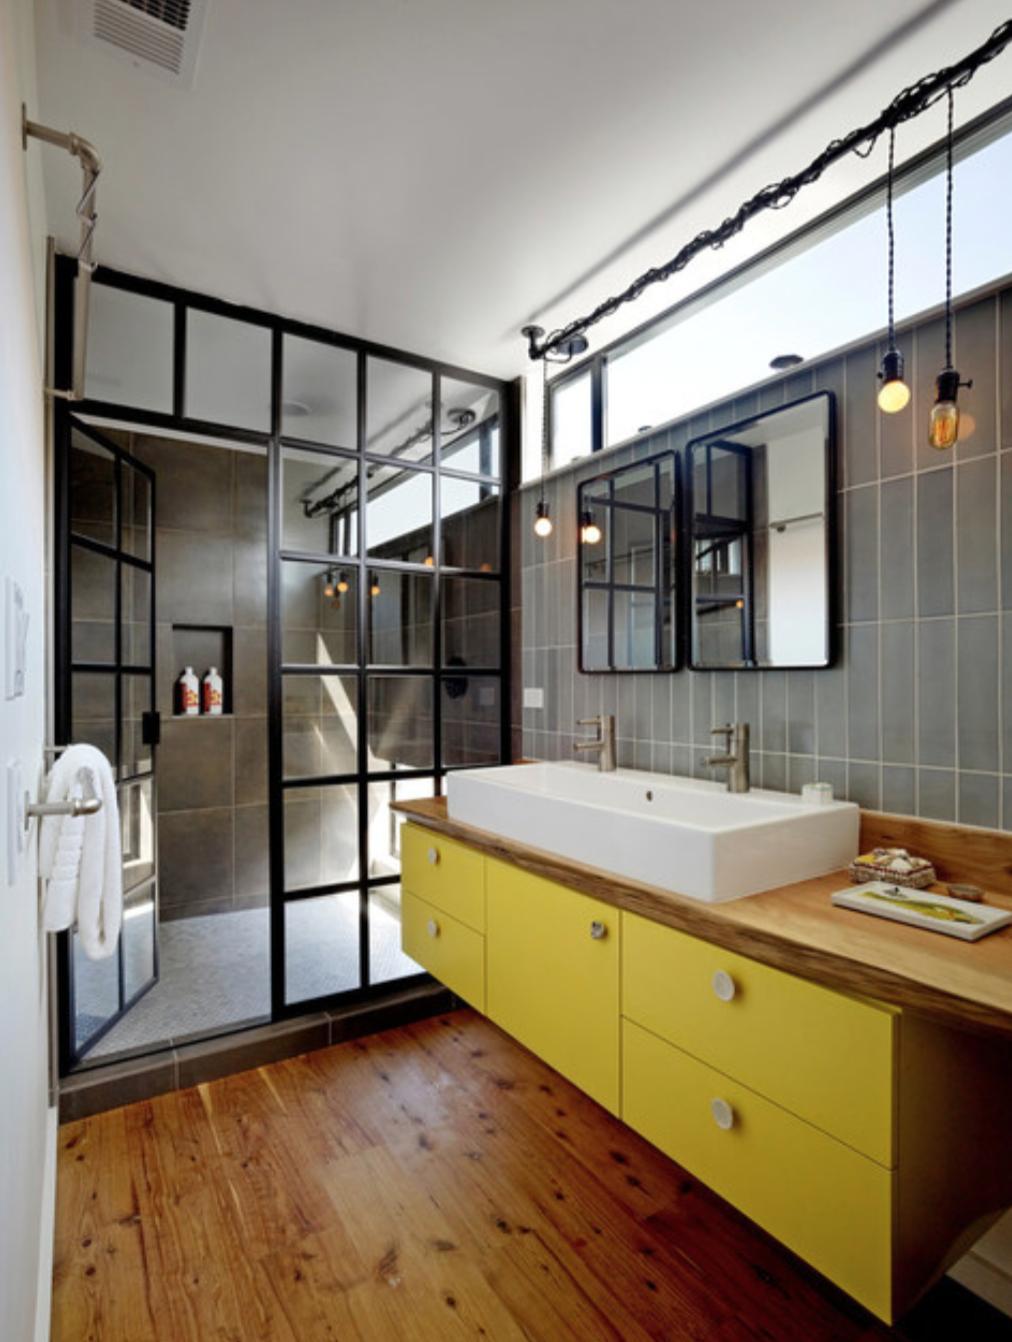 standing shower idea (aluminum + tempered glass divider; carrera